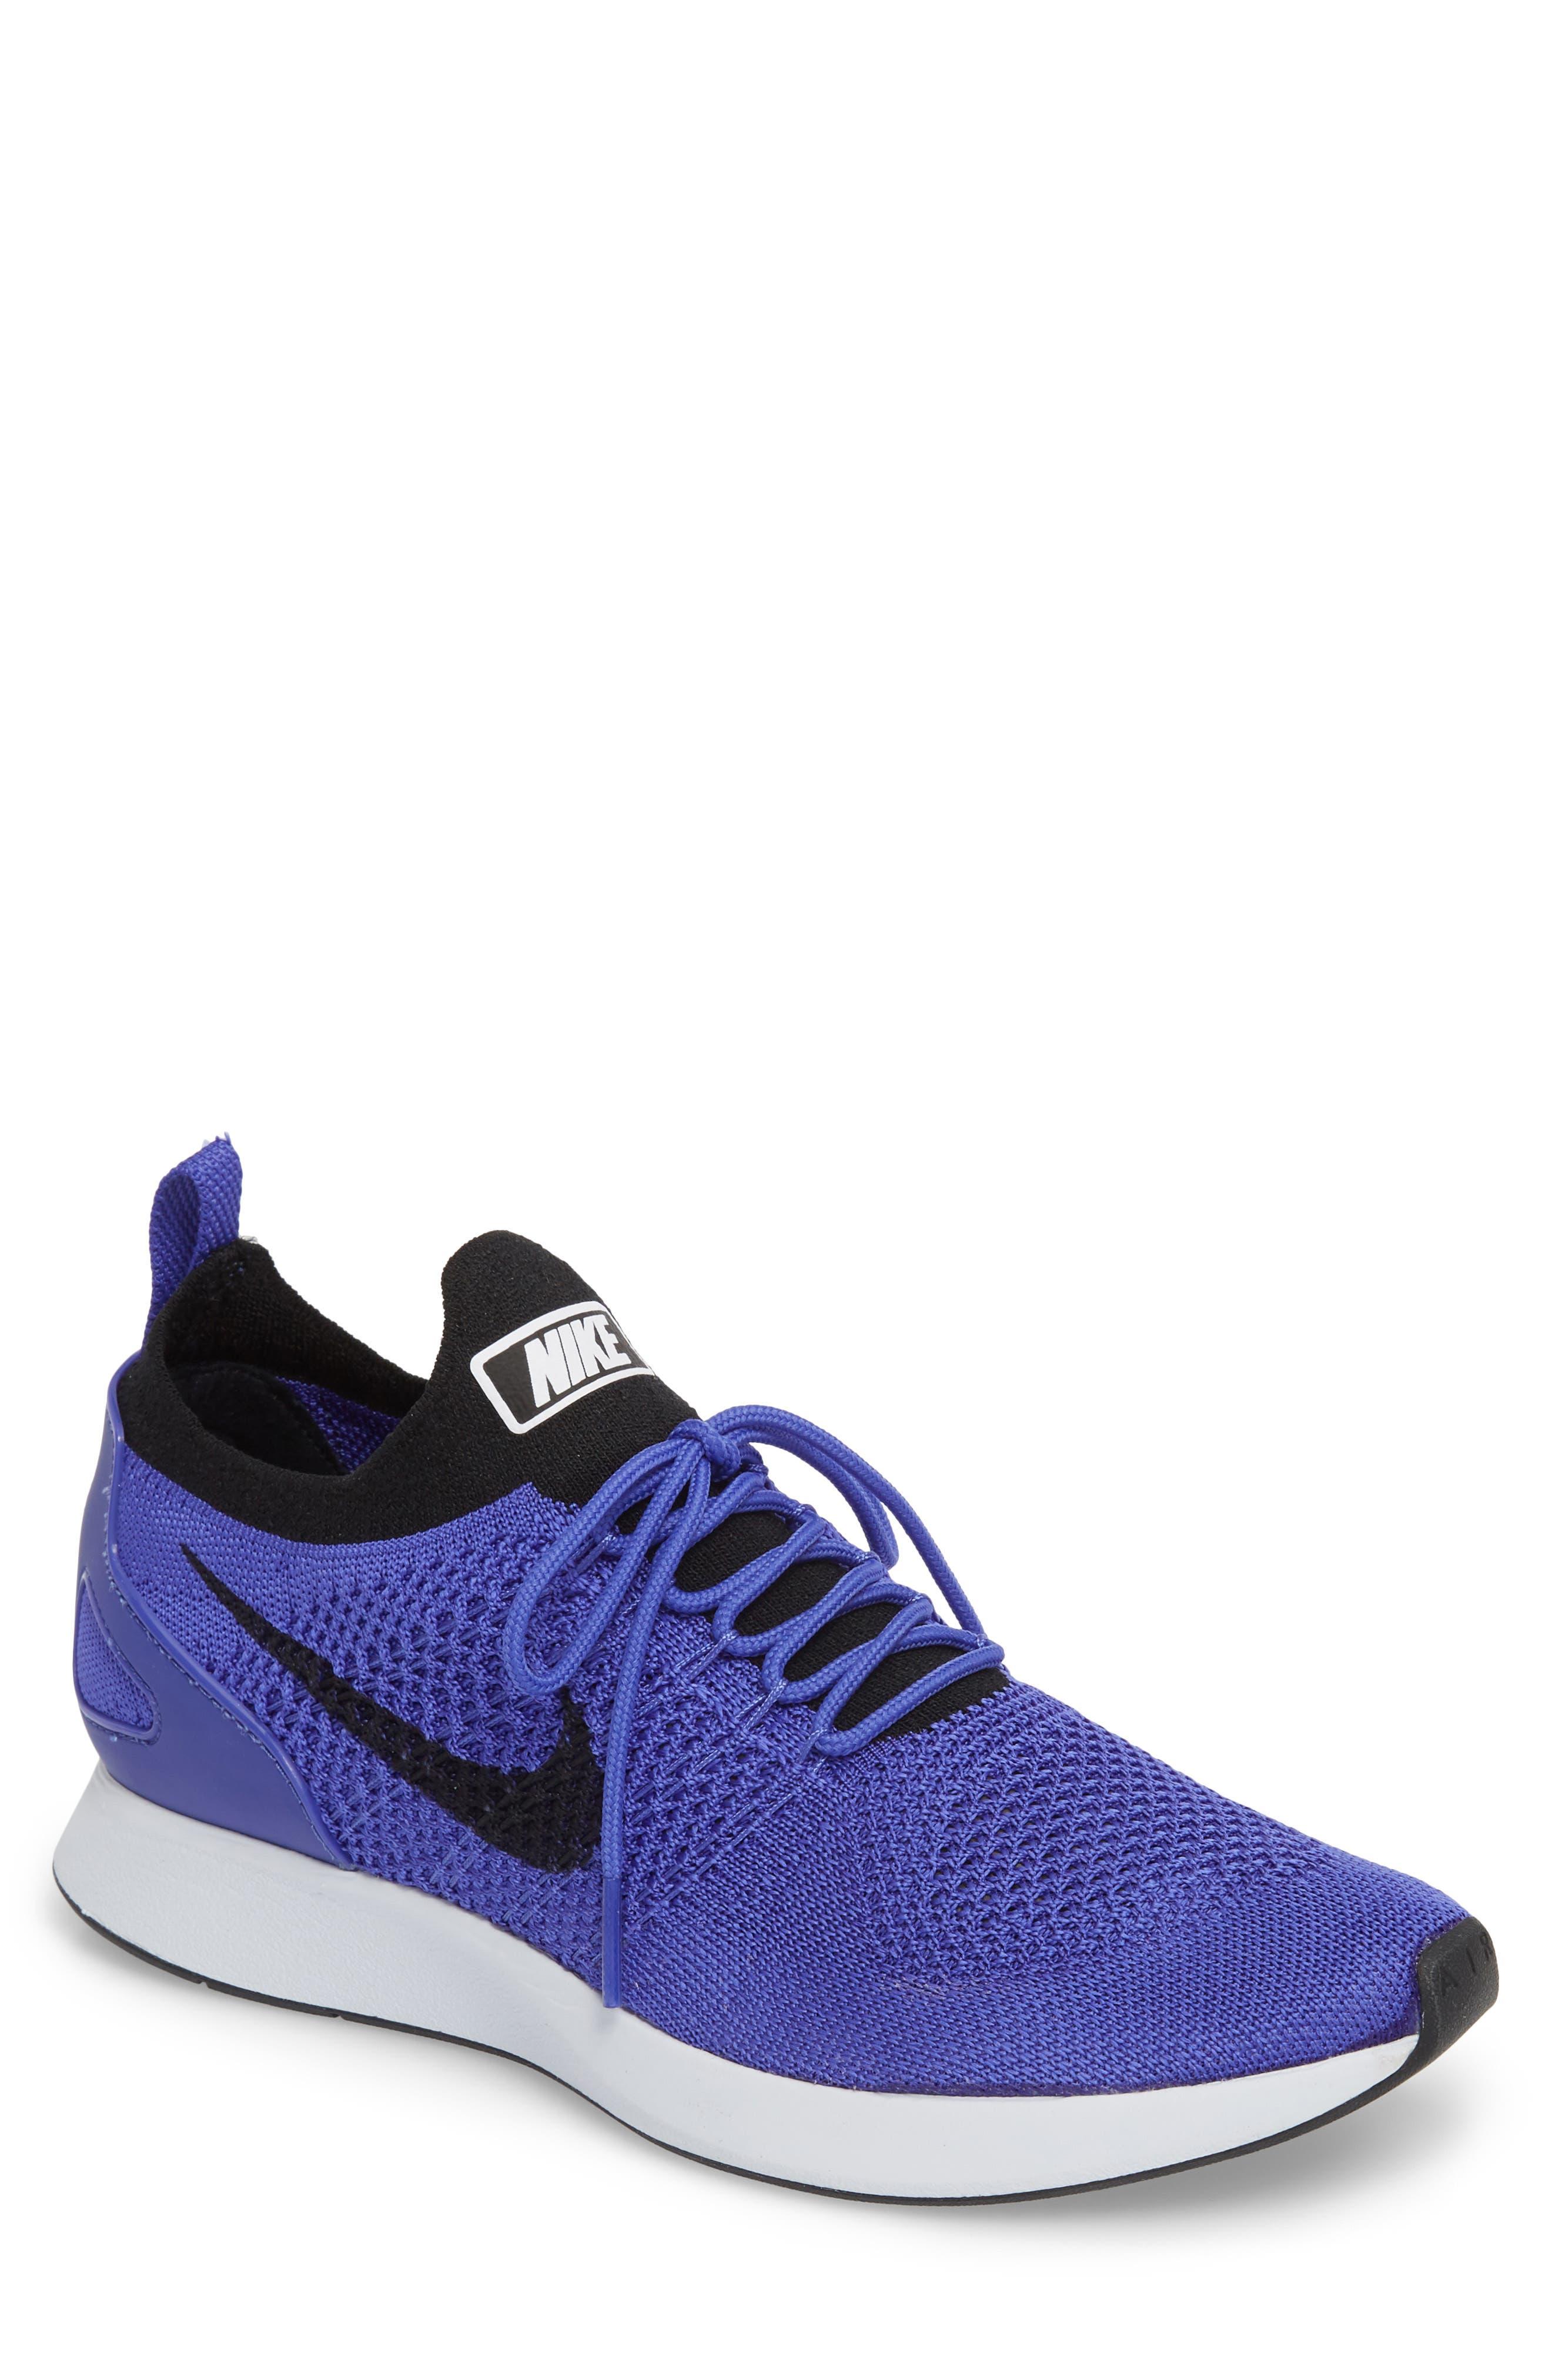 Air Zoom Mariah Flyknit Racer Sneaker,                             Main thumbnail 1, color,                             Violet/ Black/ White